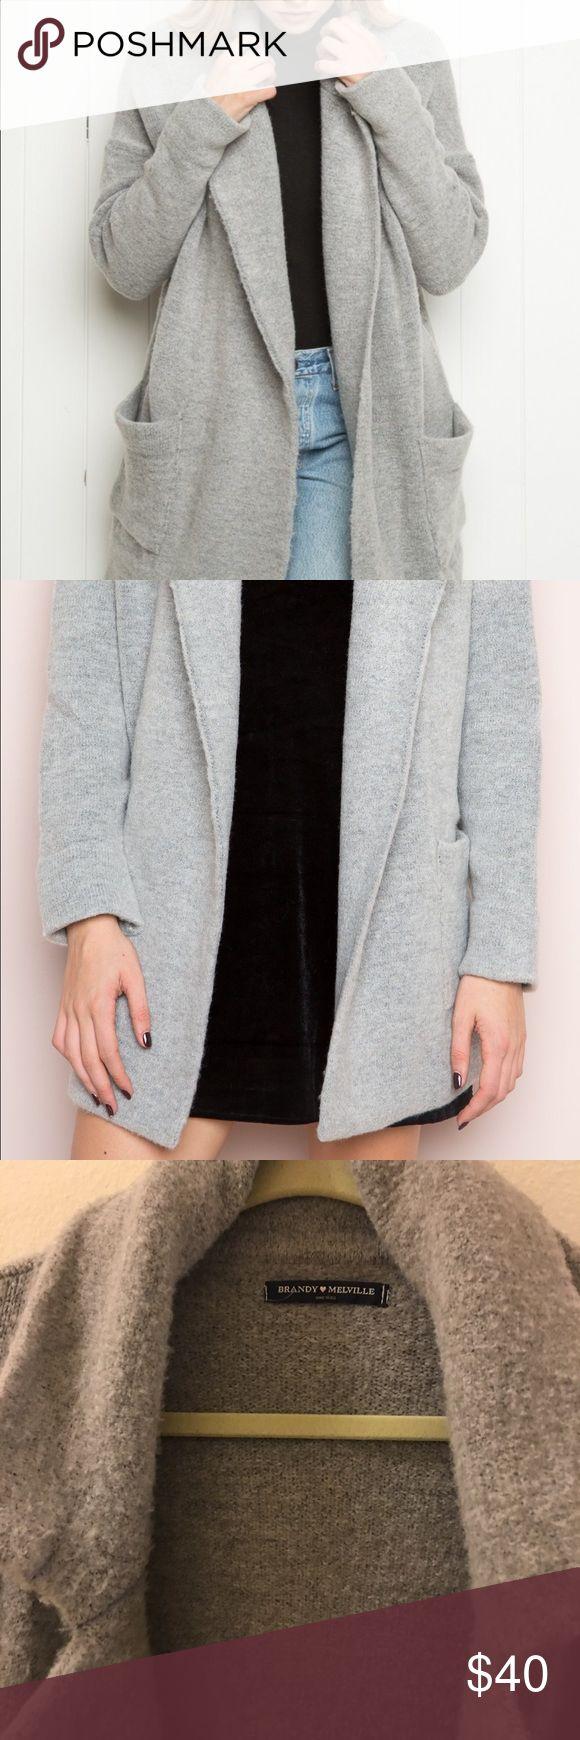 Brandy Melville cardigan coat Brandy Melville coat Brandy Melville Jackets & Coats